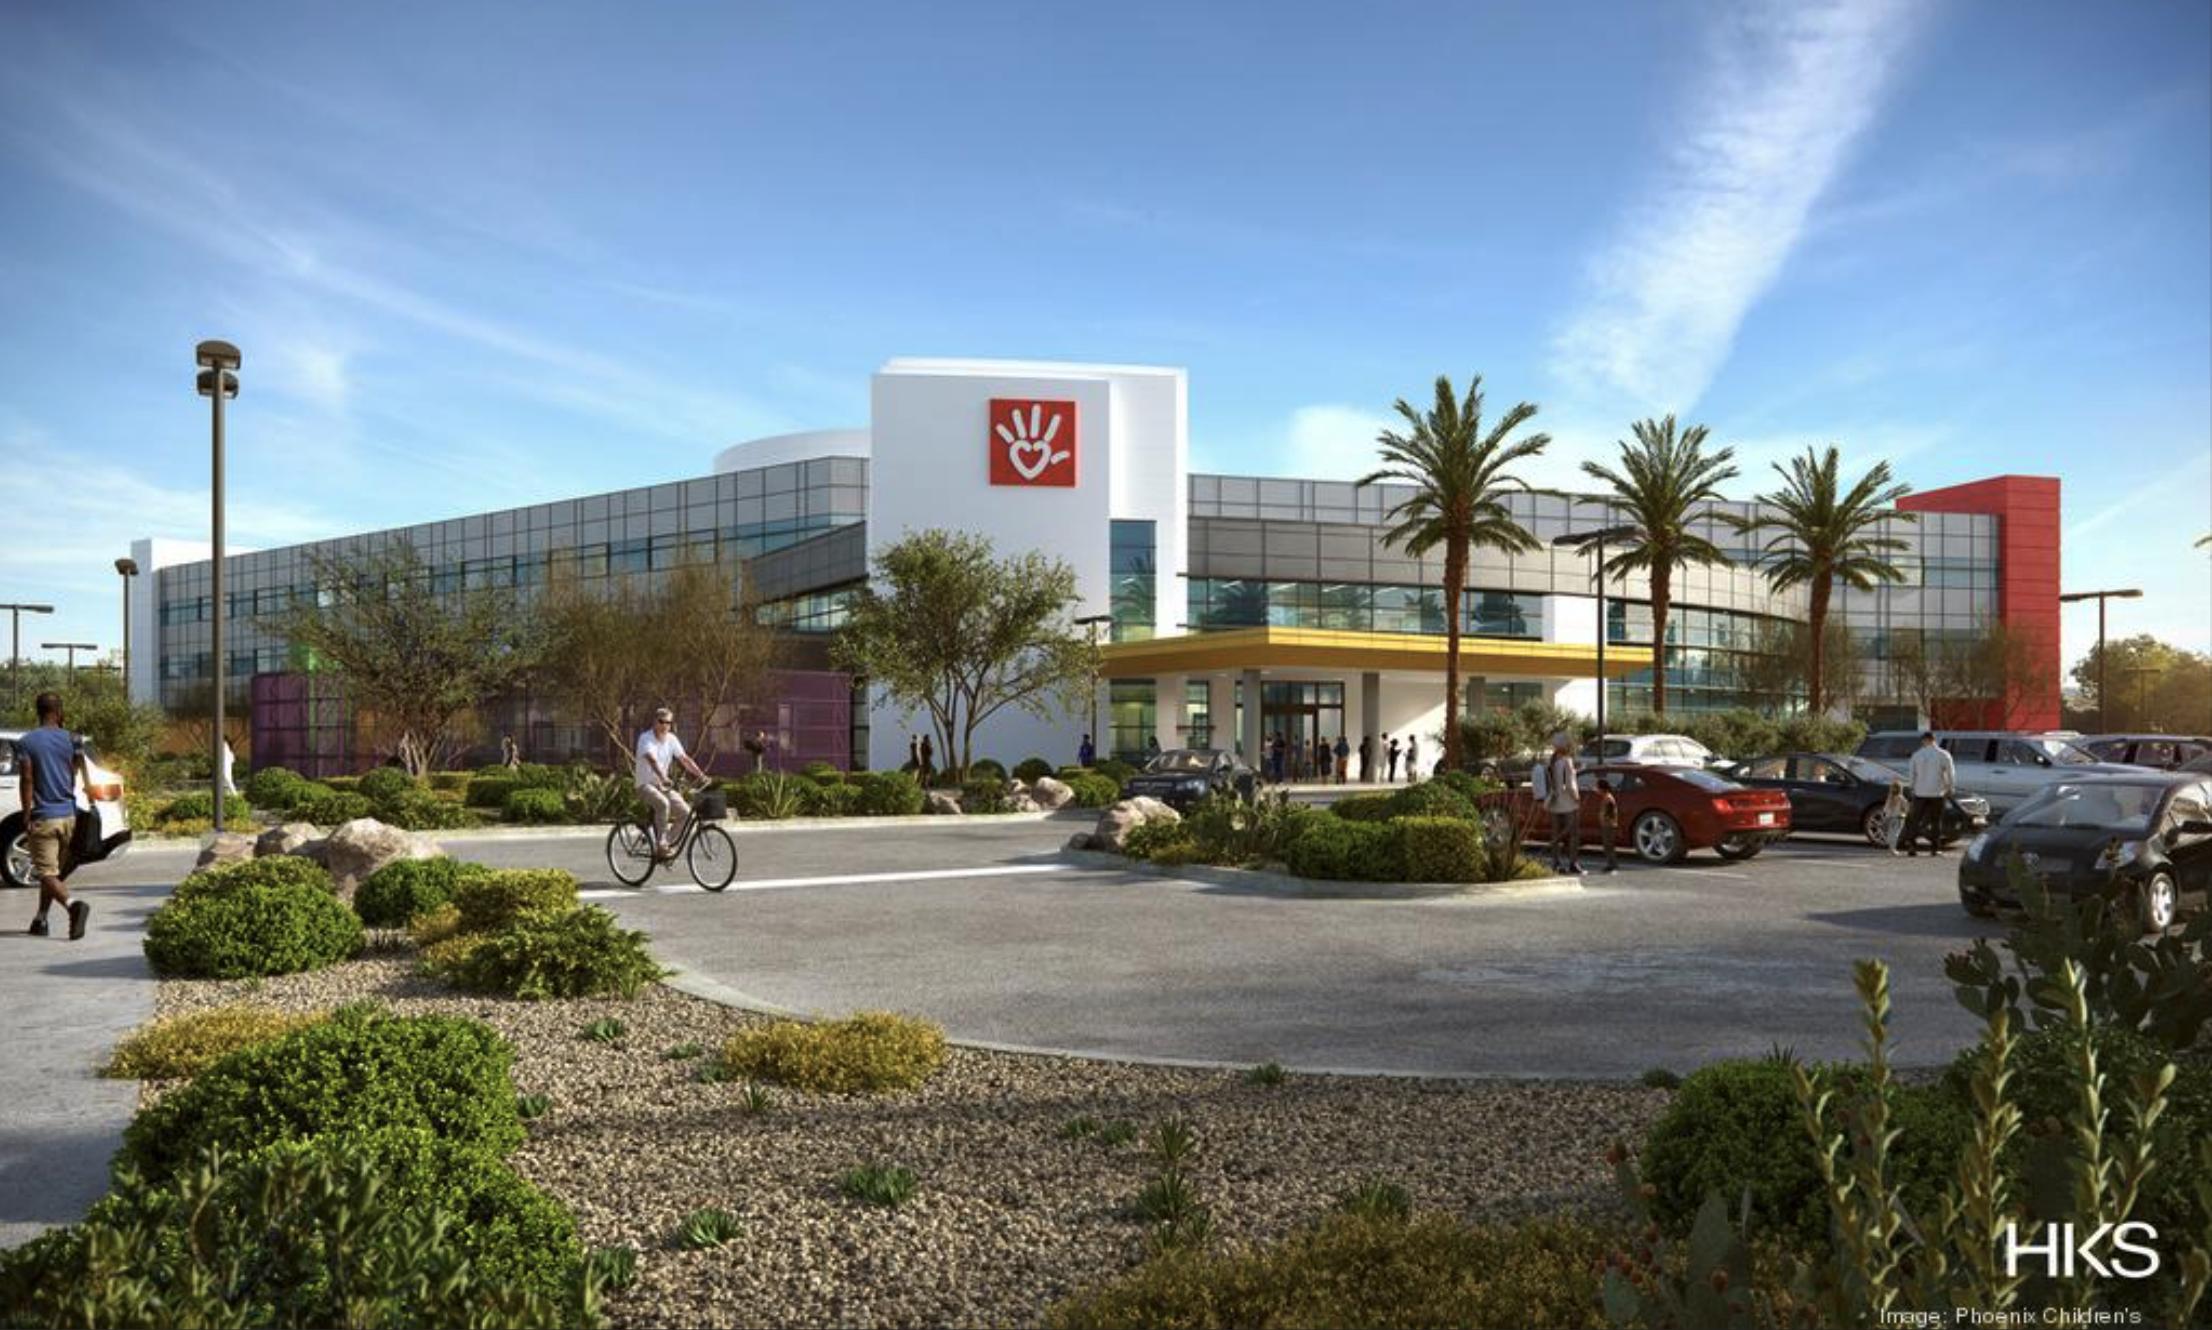 Hospital groups partner to build freestanding pediatric hospital in Glendale